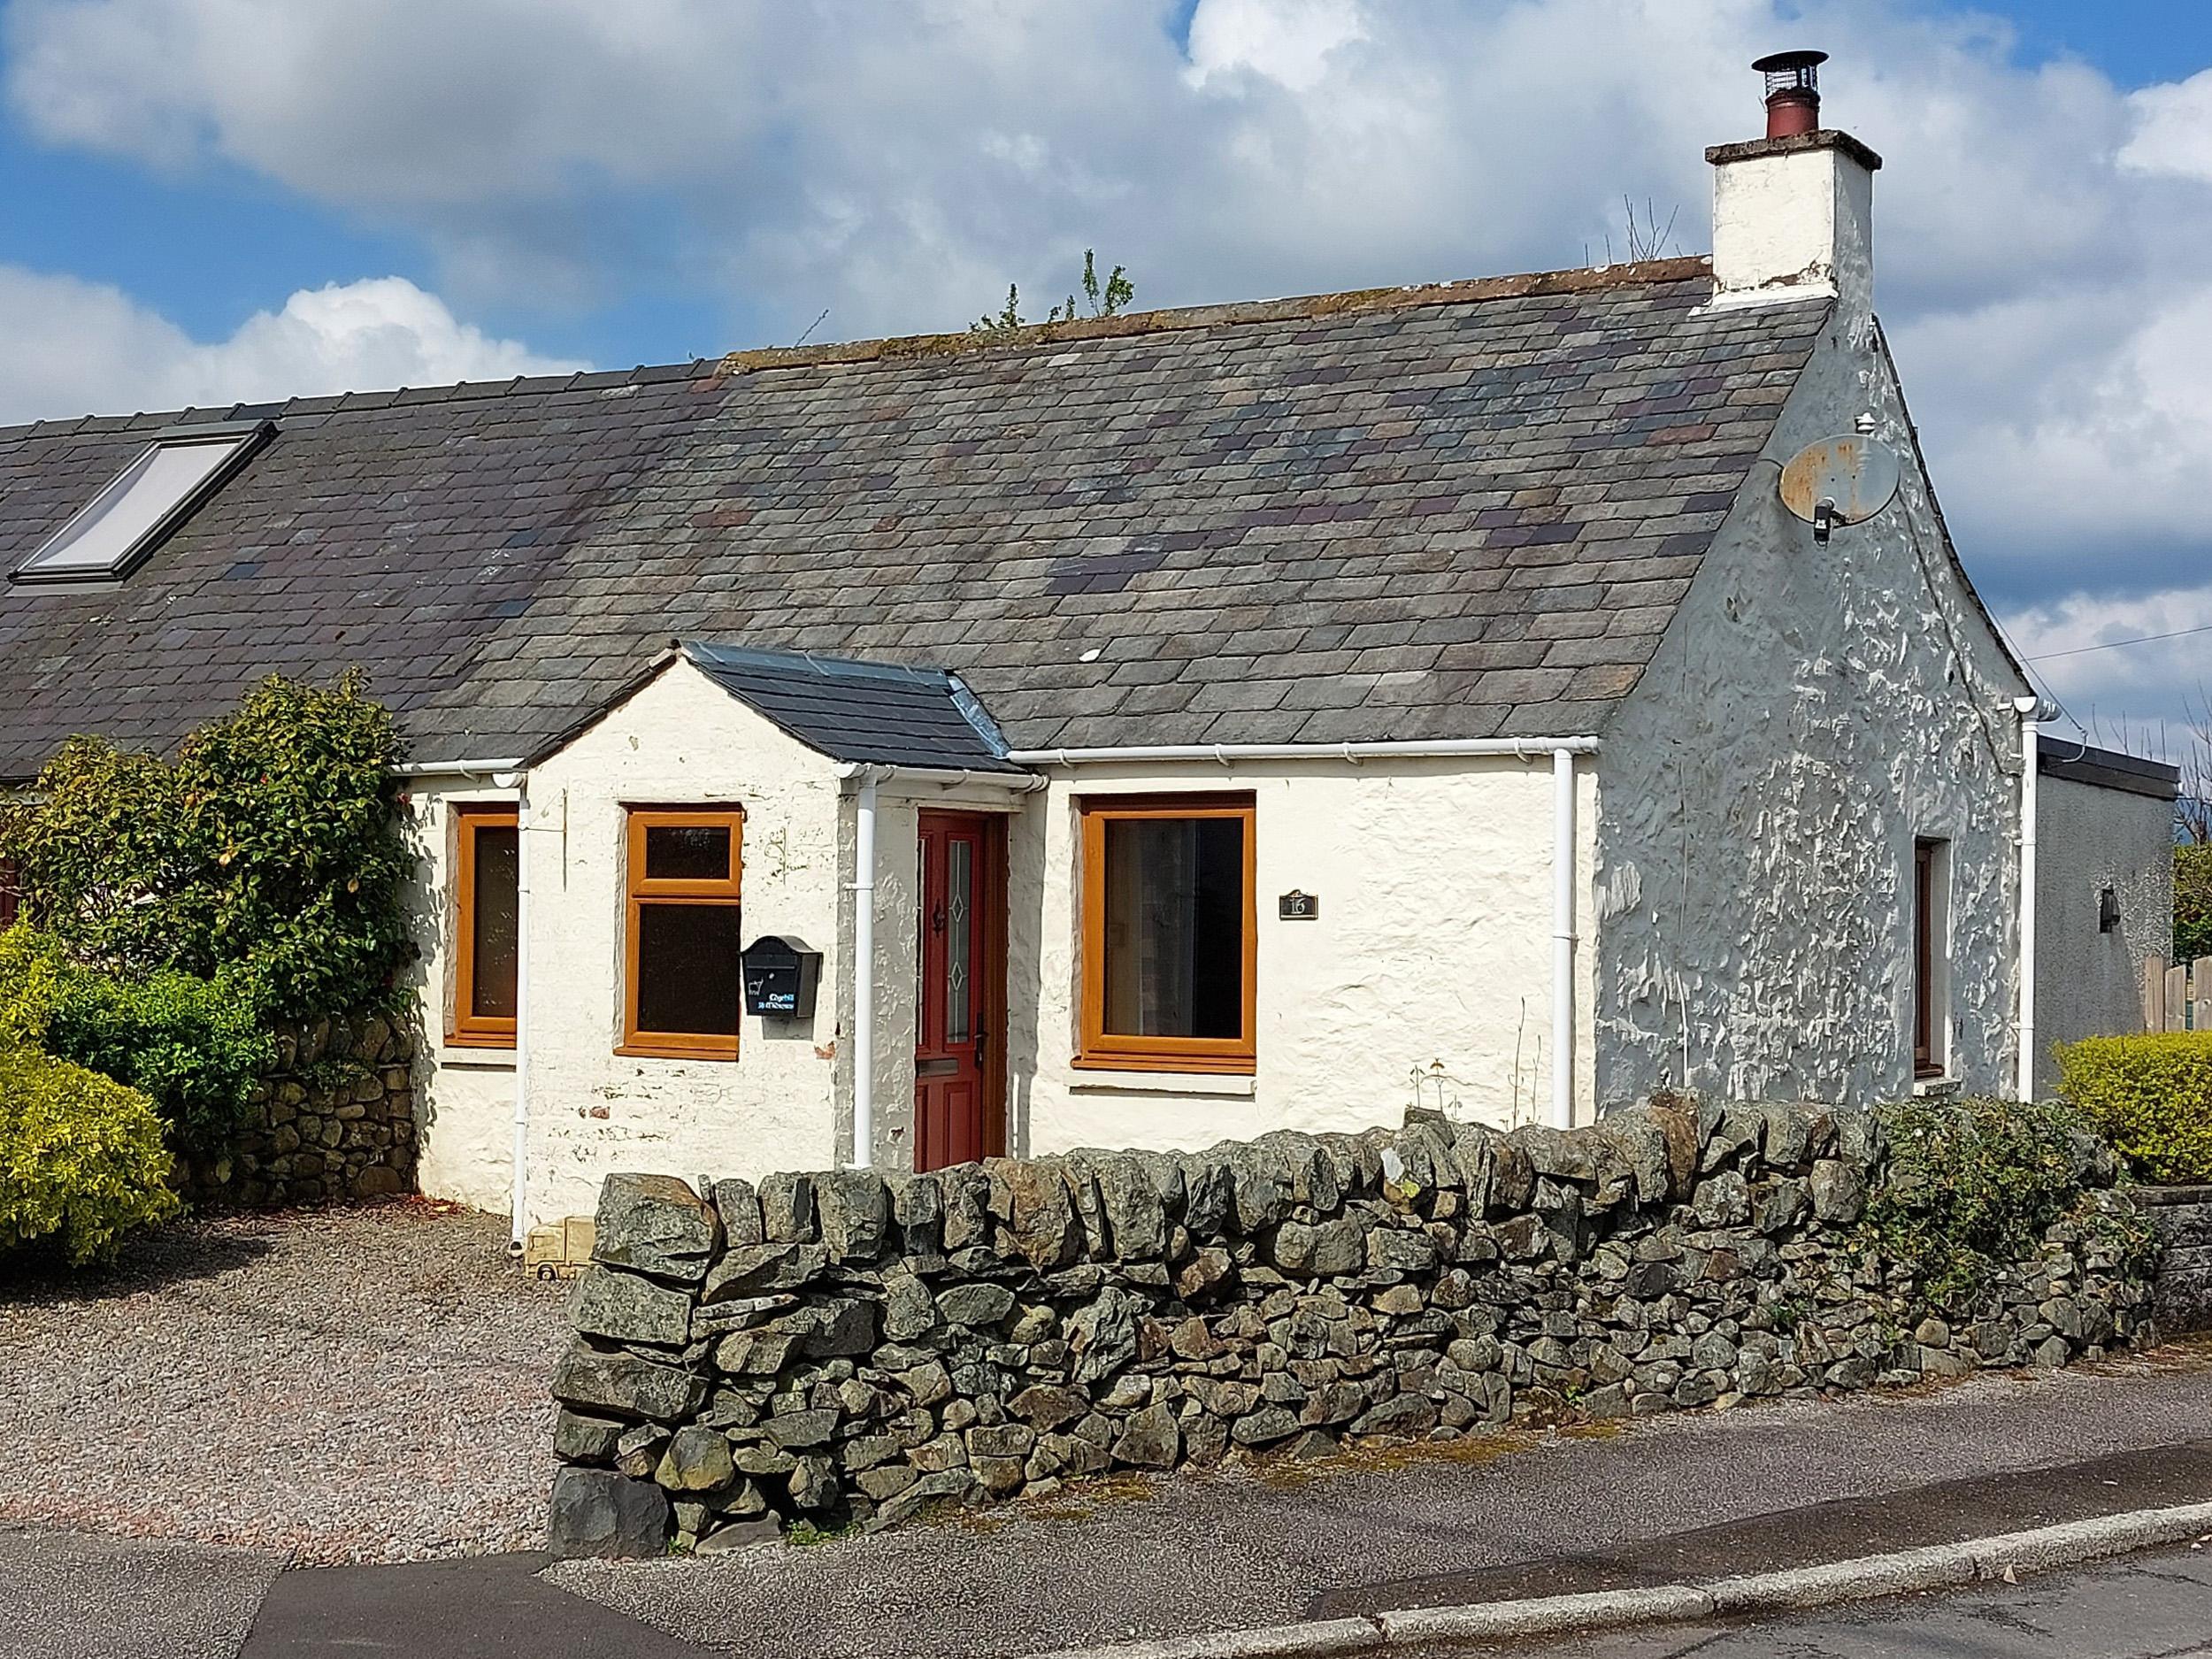 Edge Hill, St John's Town of Dalry